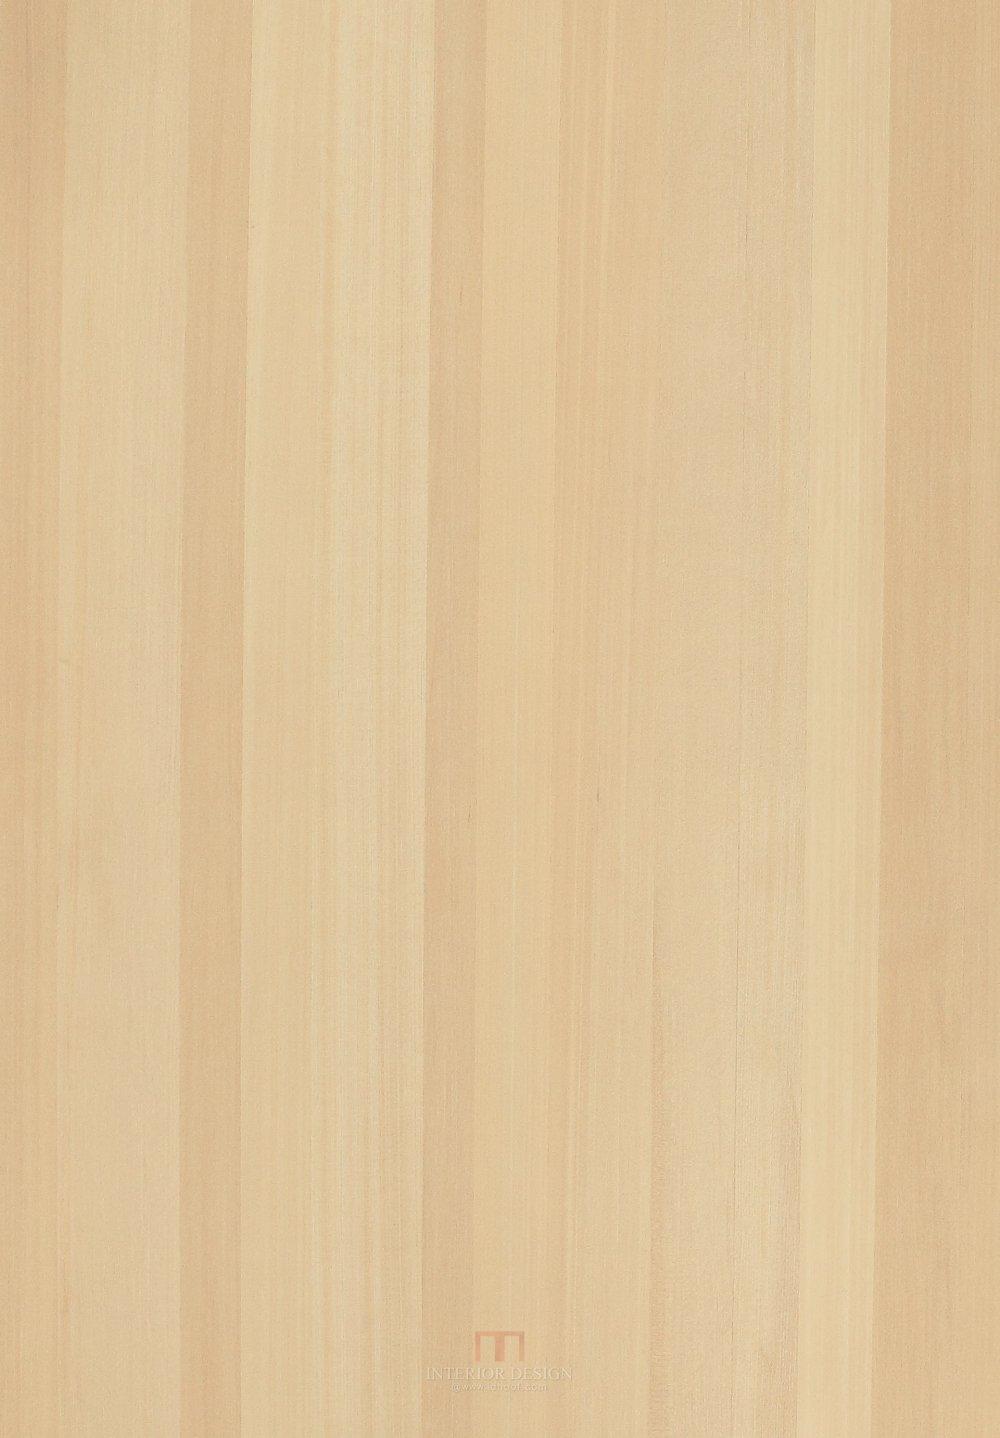 K6192CN_貝殼杉噴砂自然拼.jpg